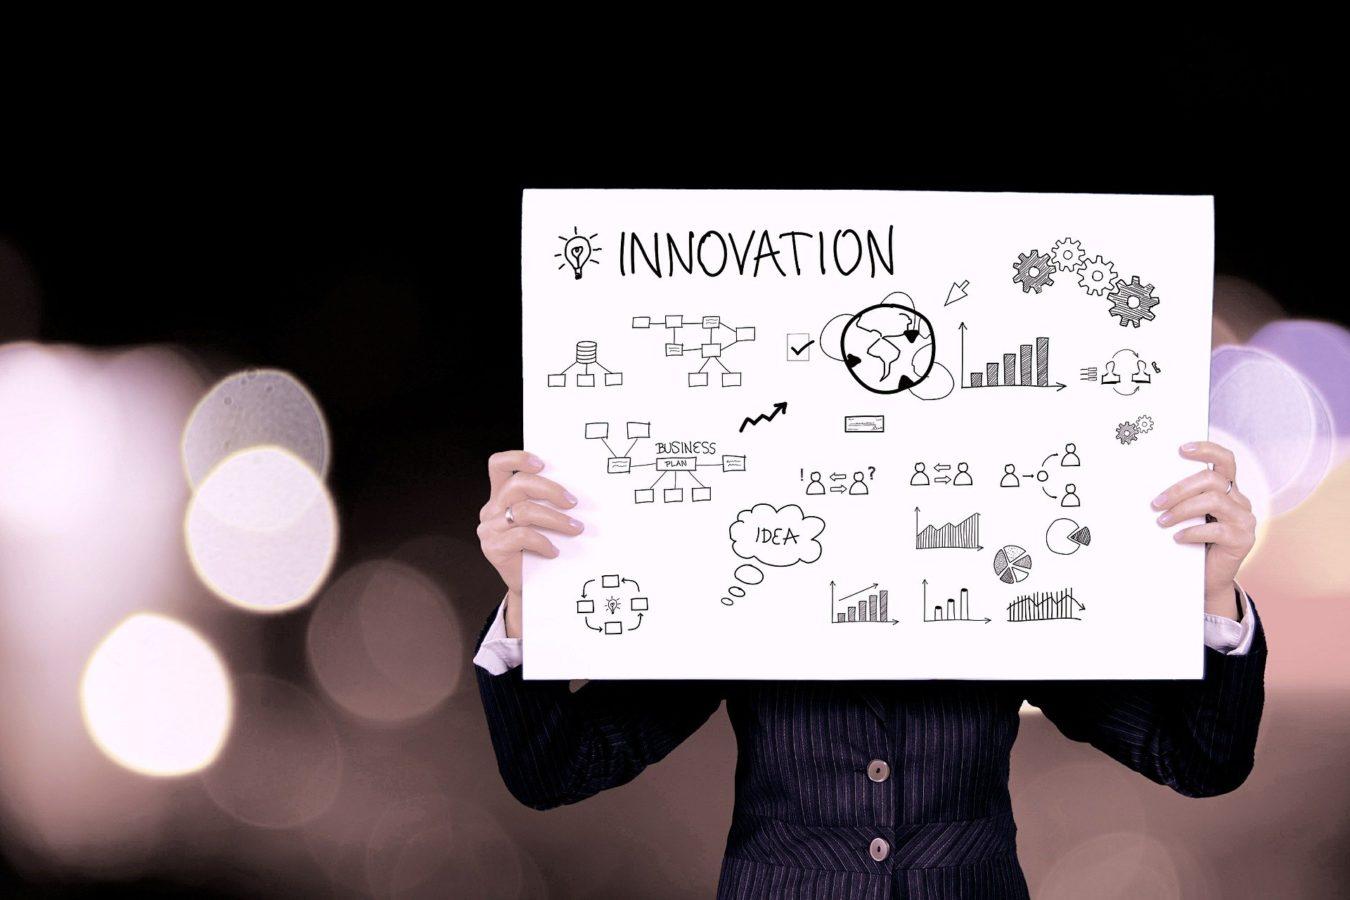 Managers, osez l'innovation avec audace